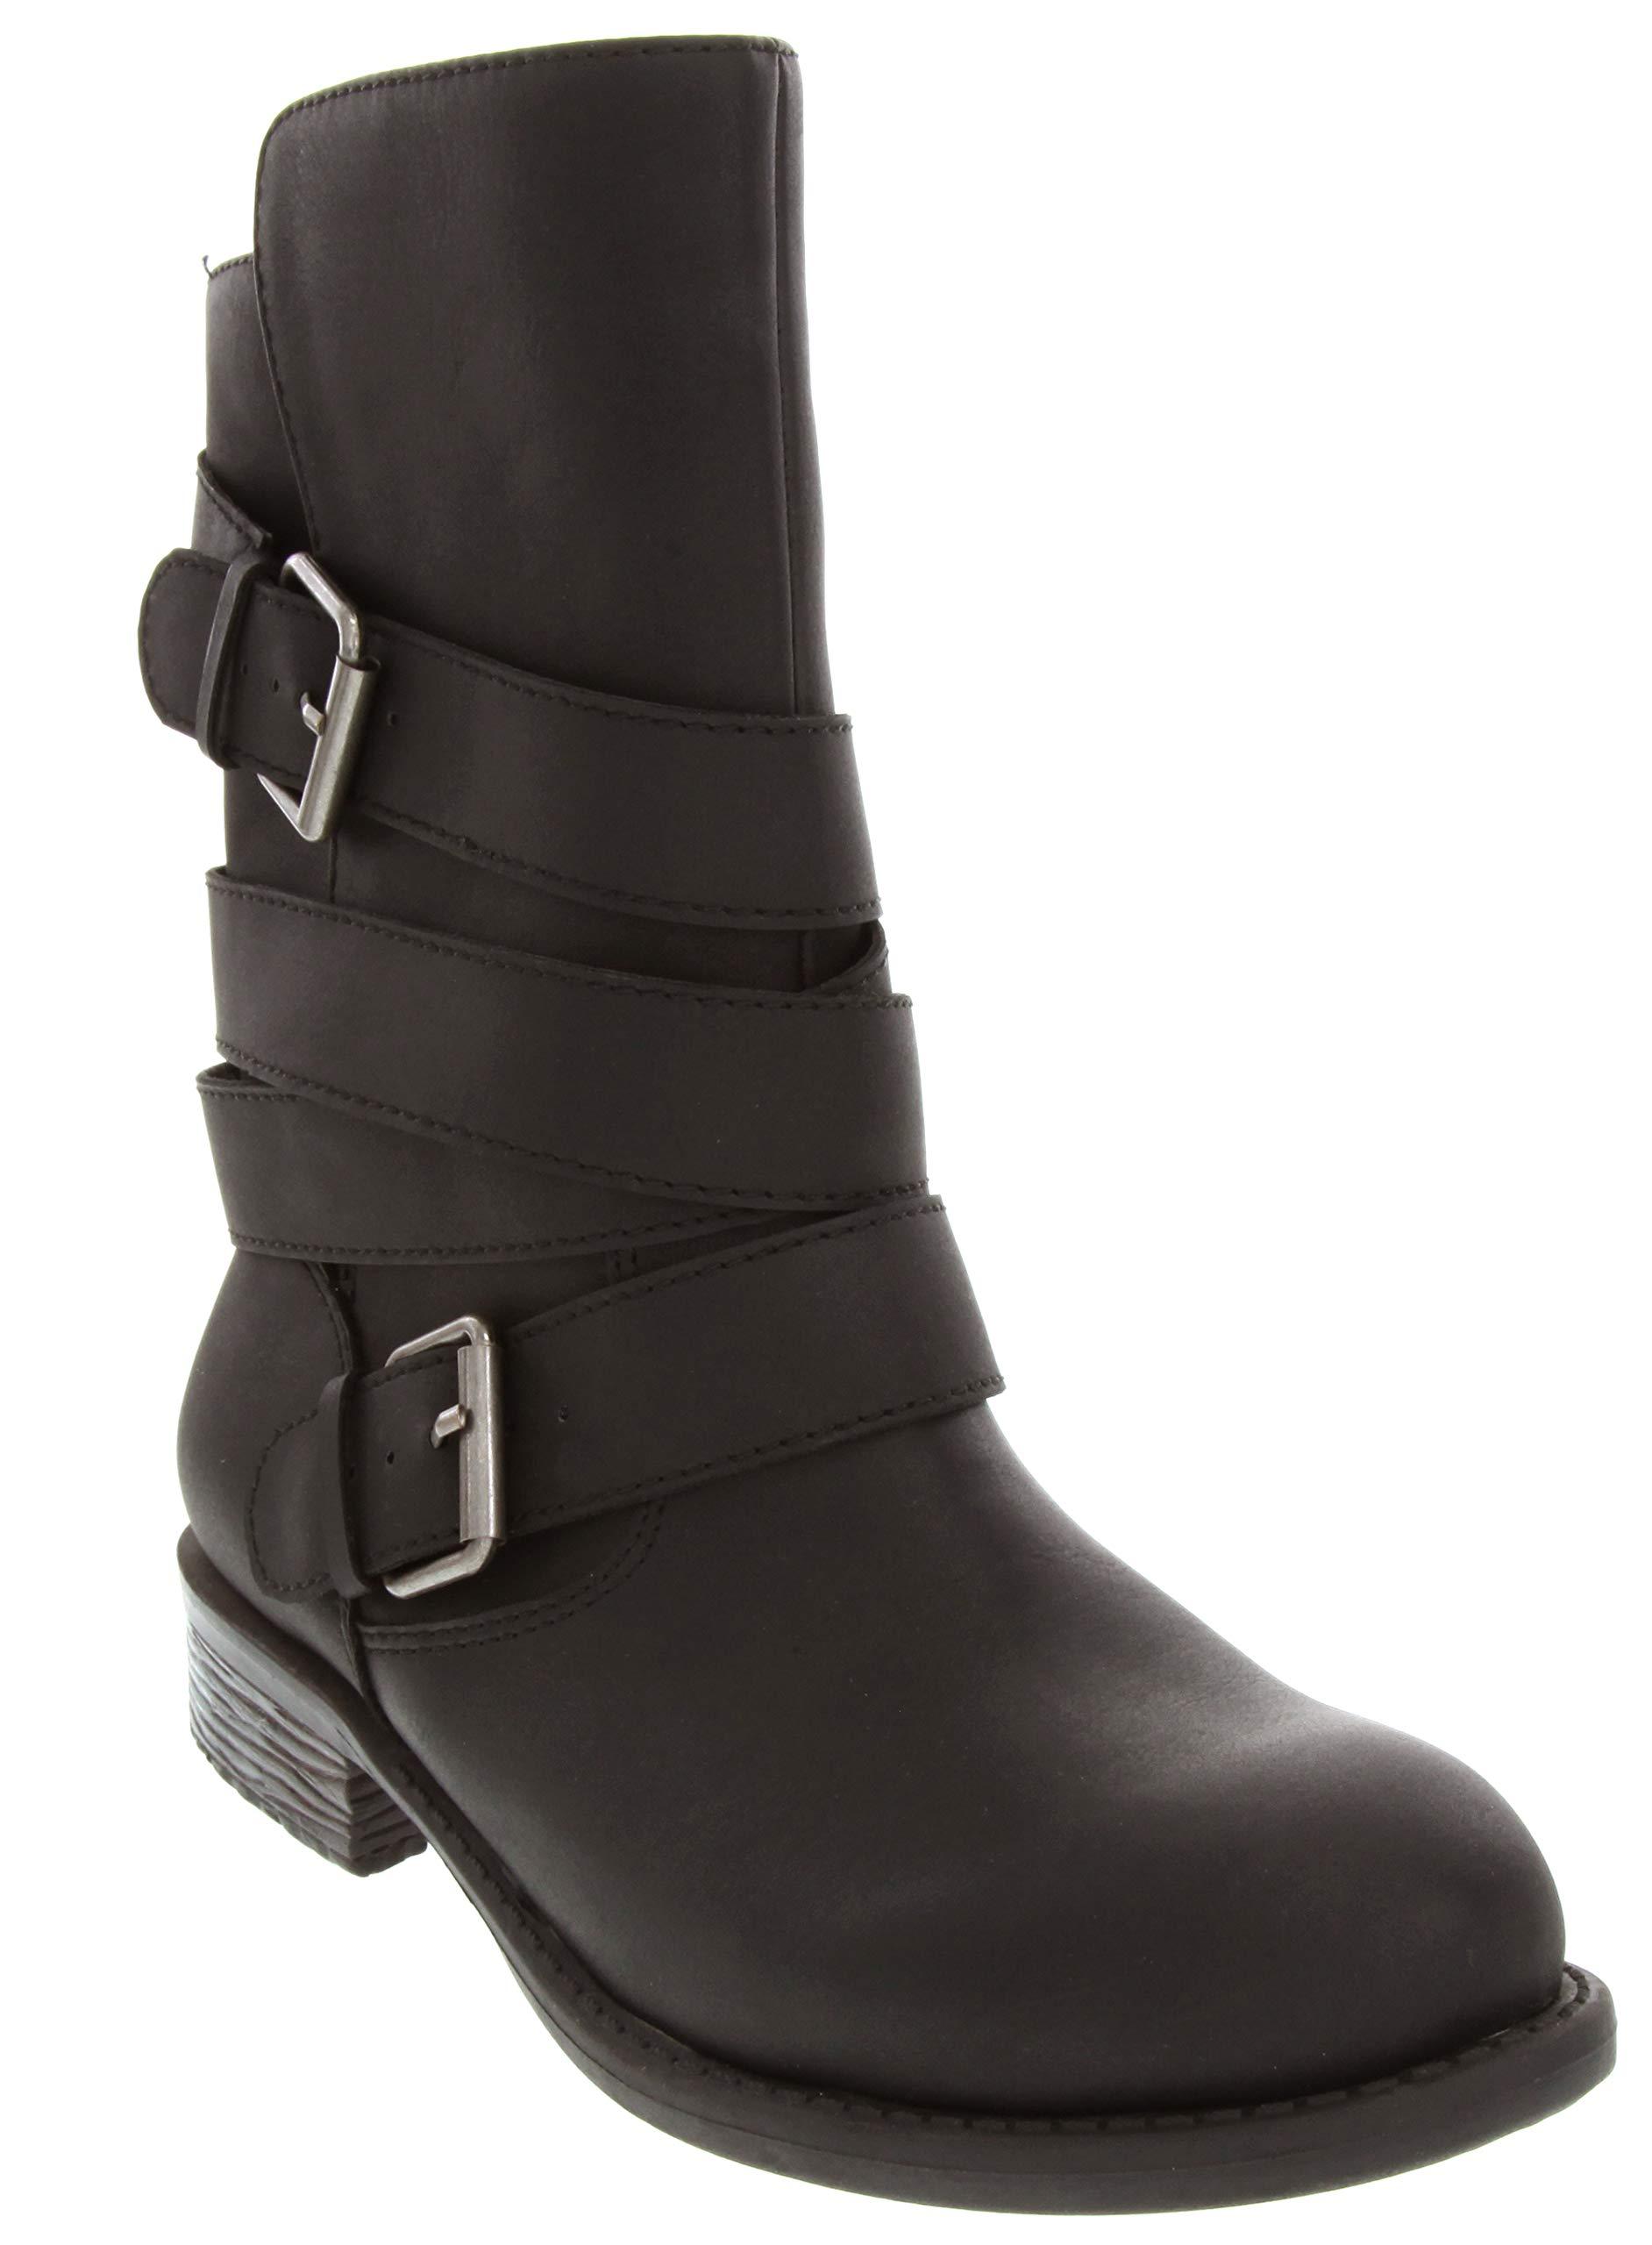 Sugar Women's Irma Dress Multi Strap Motorcycle Low Heel Mid Calf Boot Ladies Pull On Moto Black Nubuck 6.5